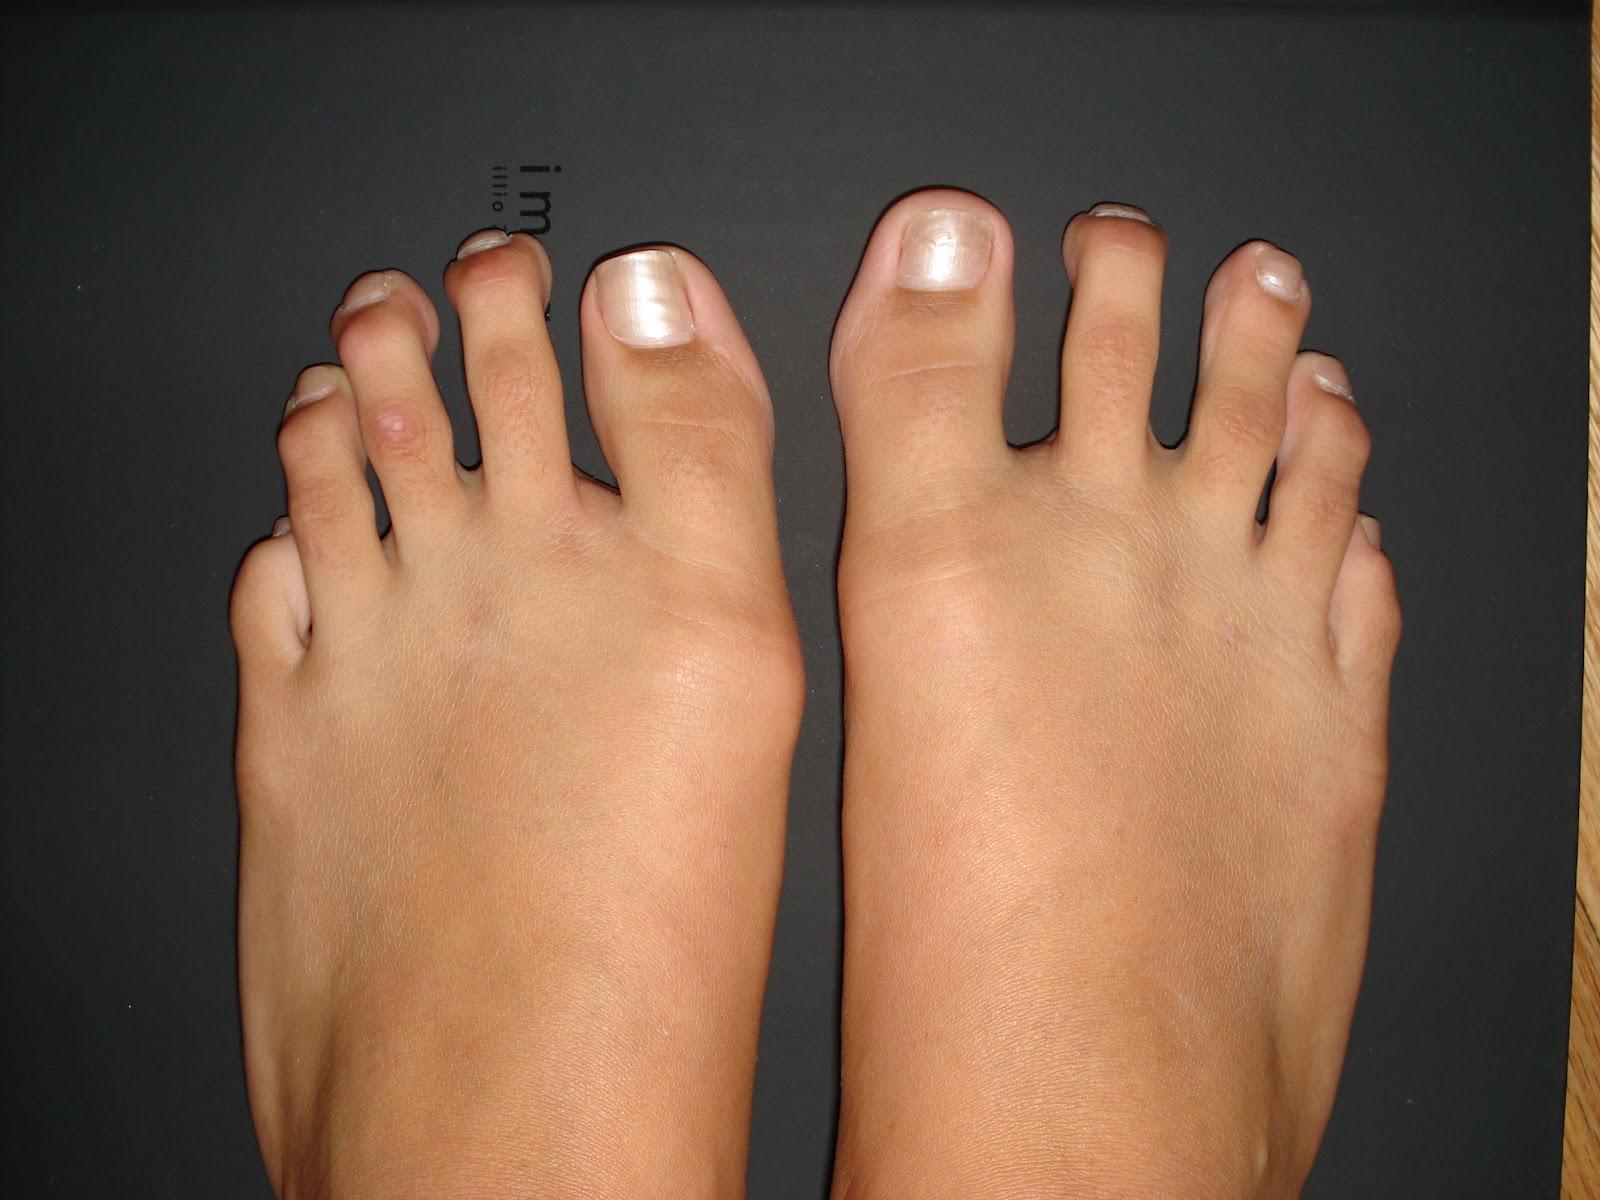 Surgery Heels Shortening Toe After